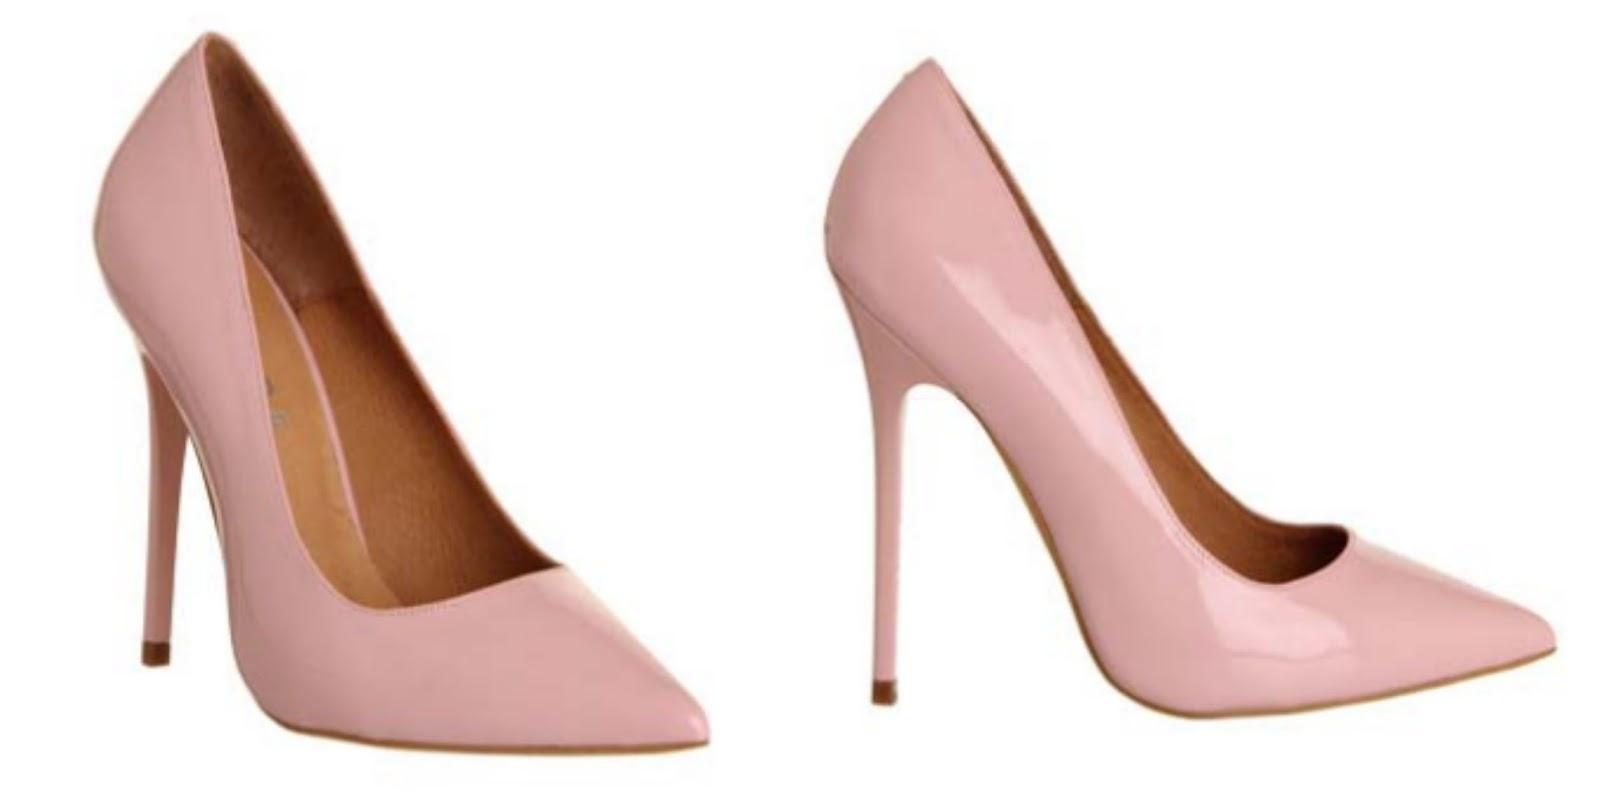 7f50c21efc45 Office On Tops Pastel Pink Heels- £65